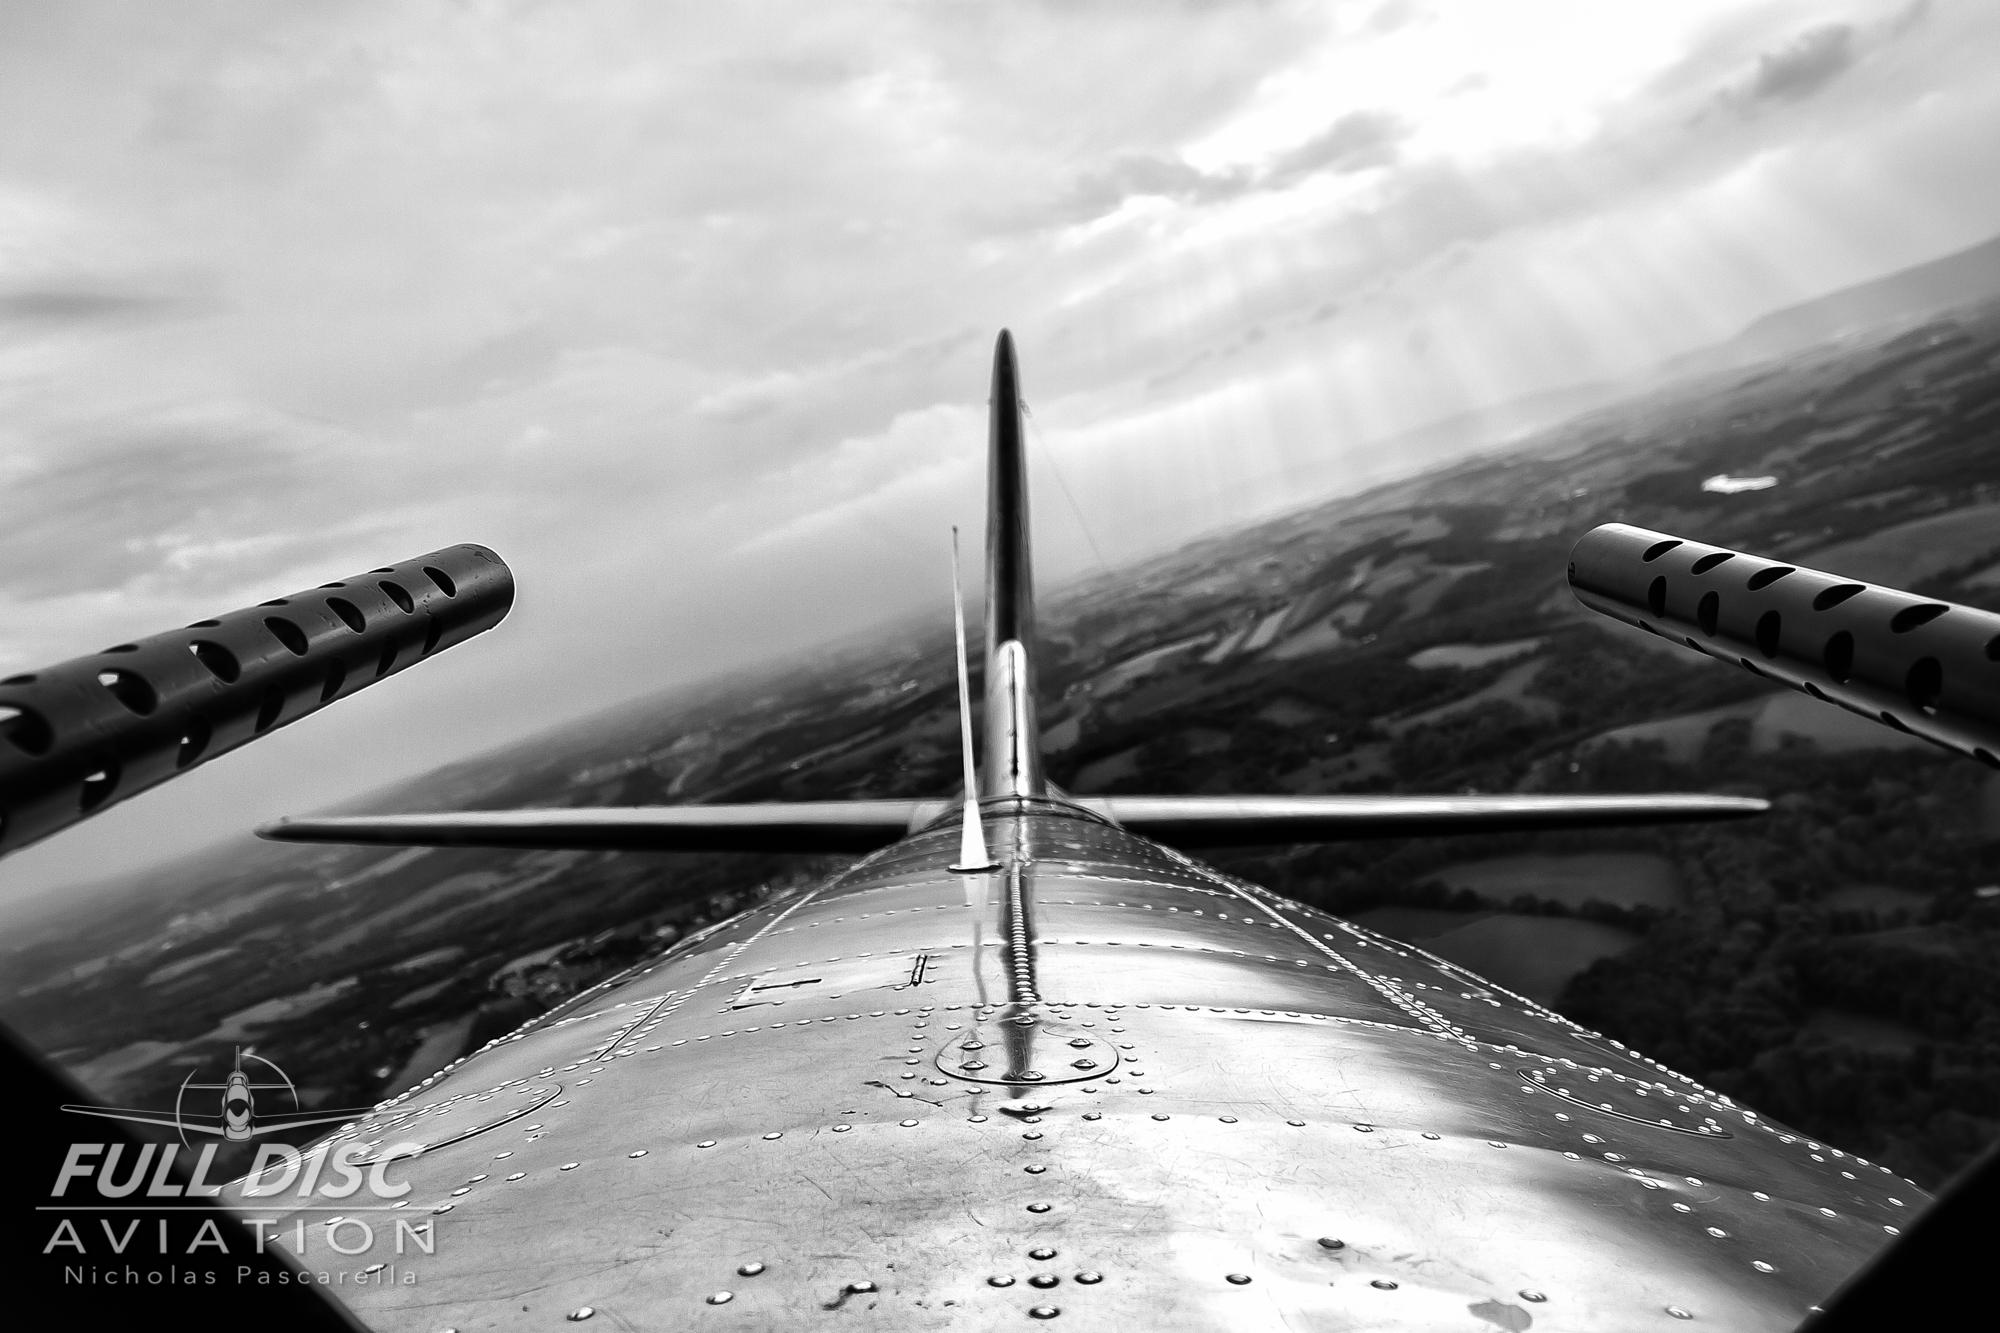 nickpascarella_nicholaspascarella_fulldiscaviation_aircraft_b17_turret.jpg